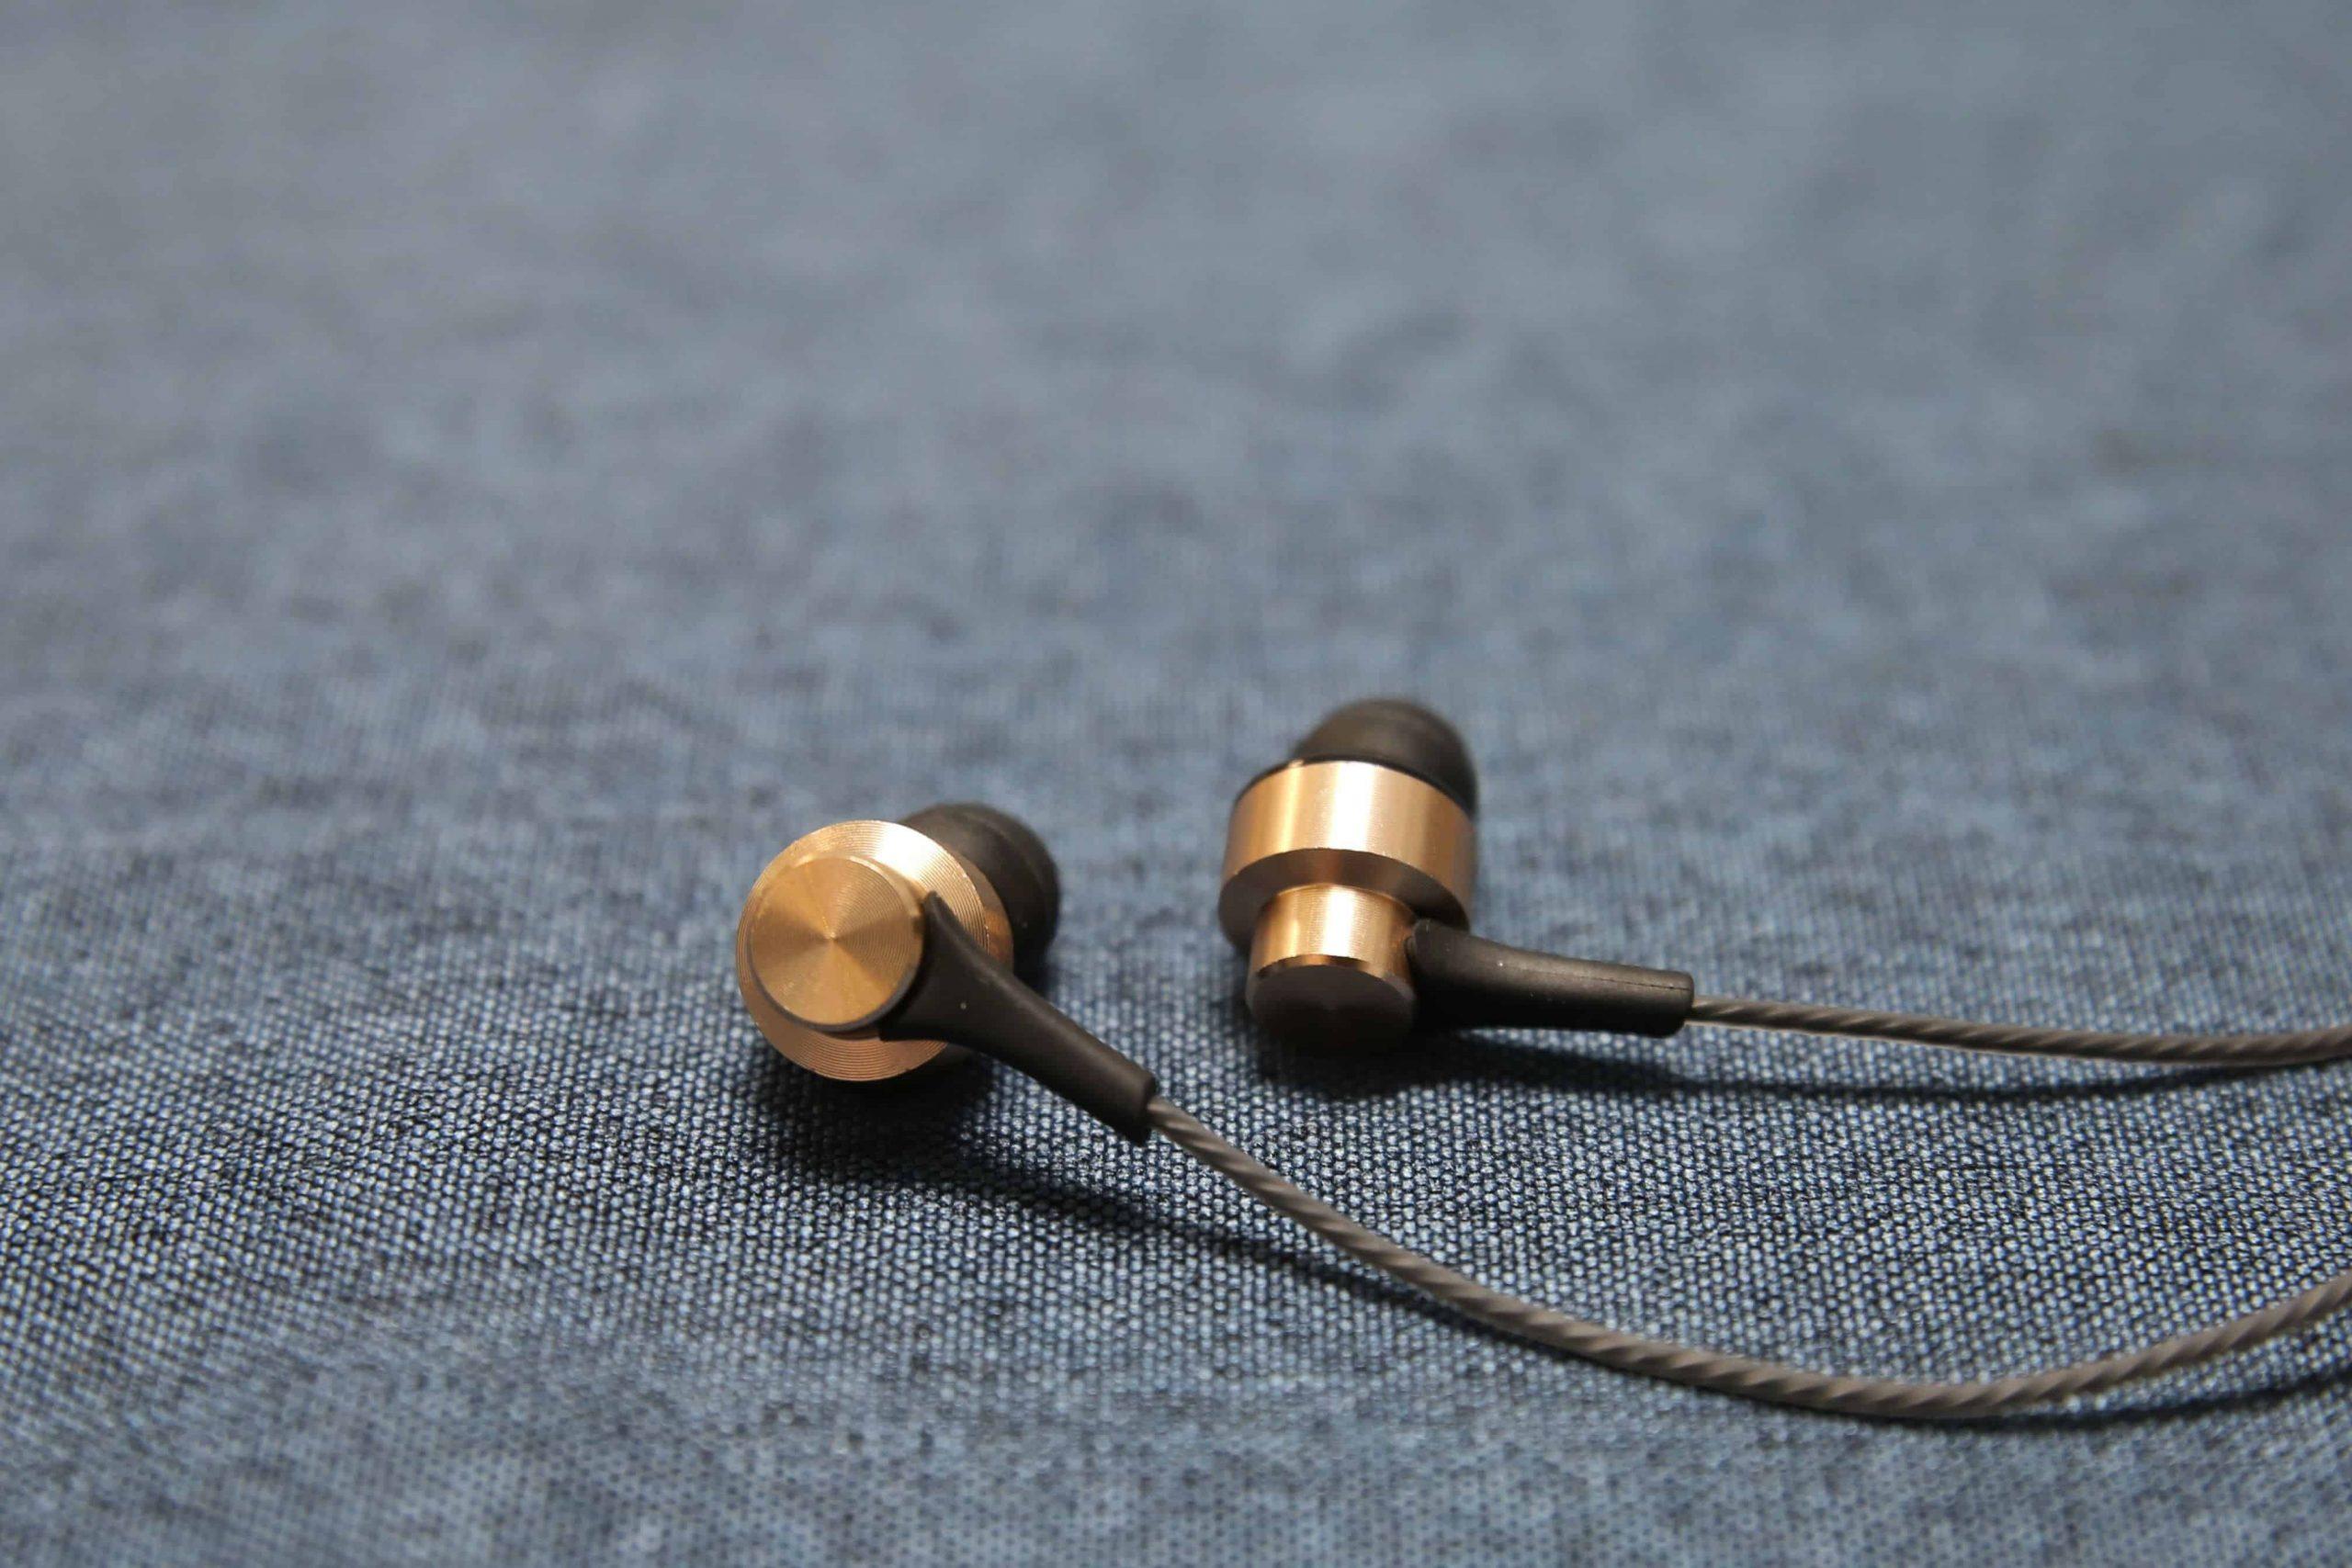 AIWA愛華最新千元內高CP值有線入耳式耳機 – AIWA EW101GN